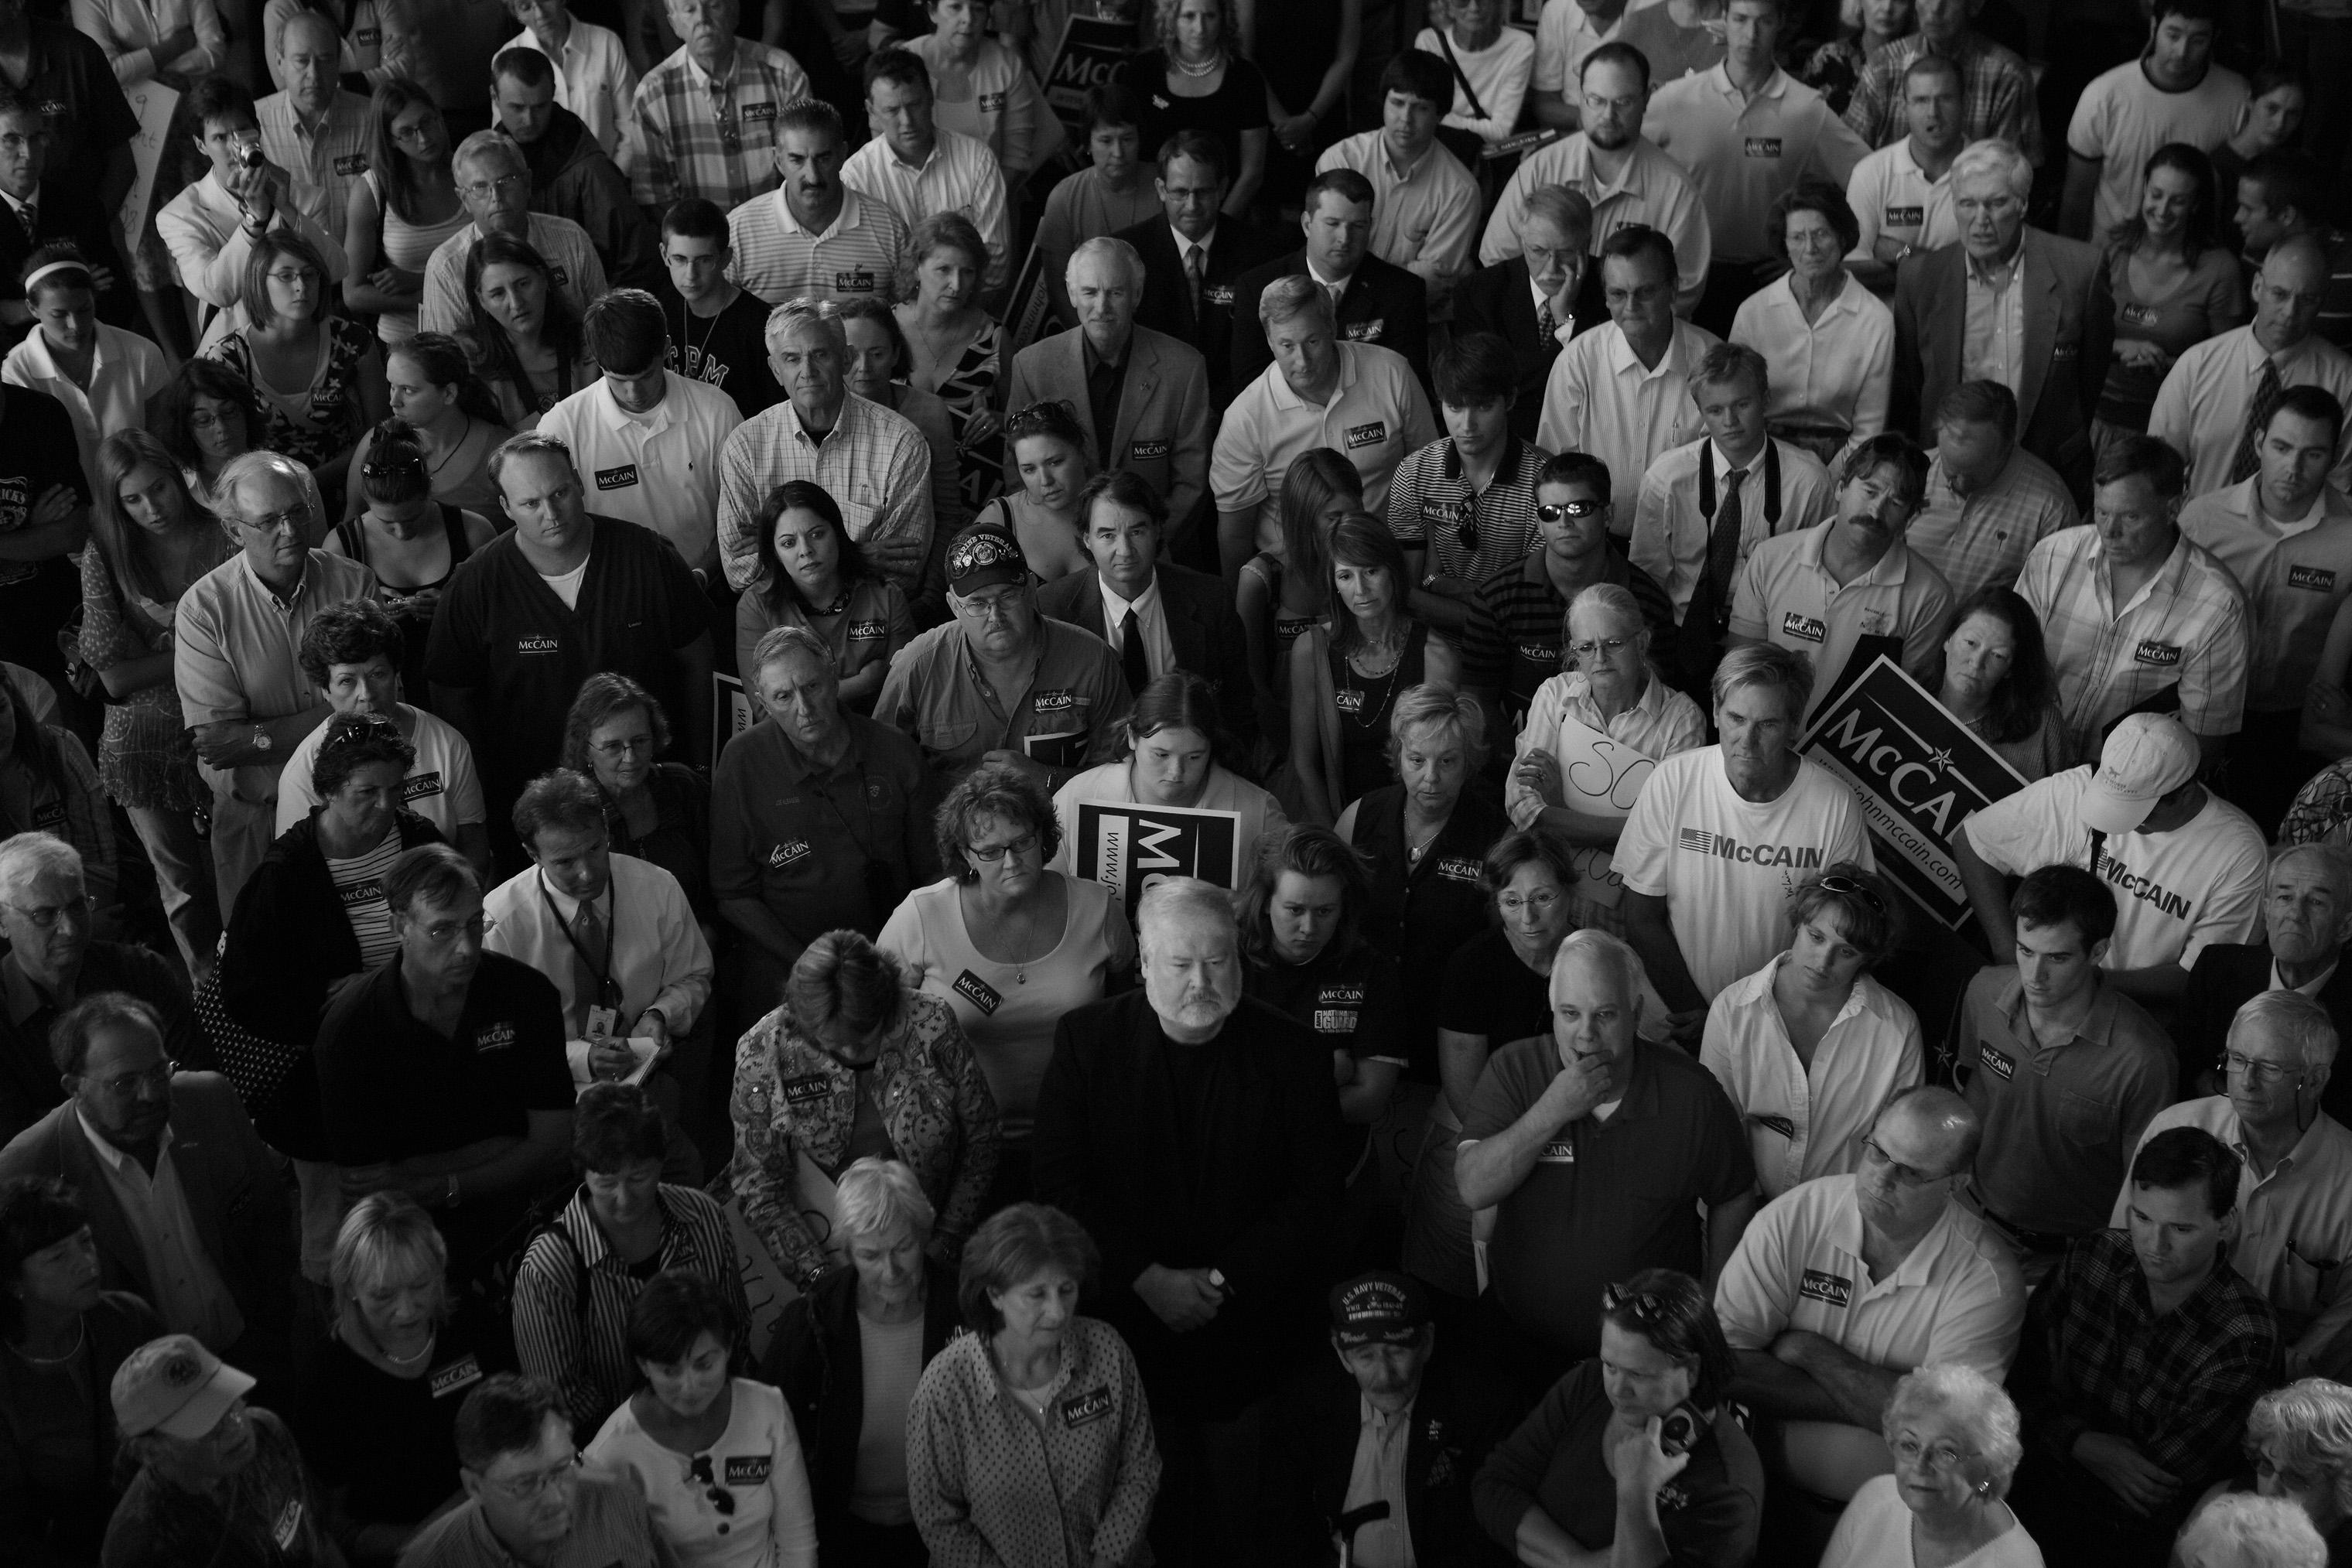 Sen. John McCain campaigns in Charleston, S.C. on April 26, 2007.